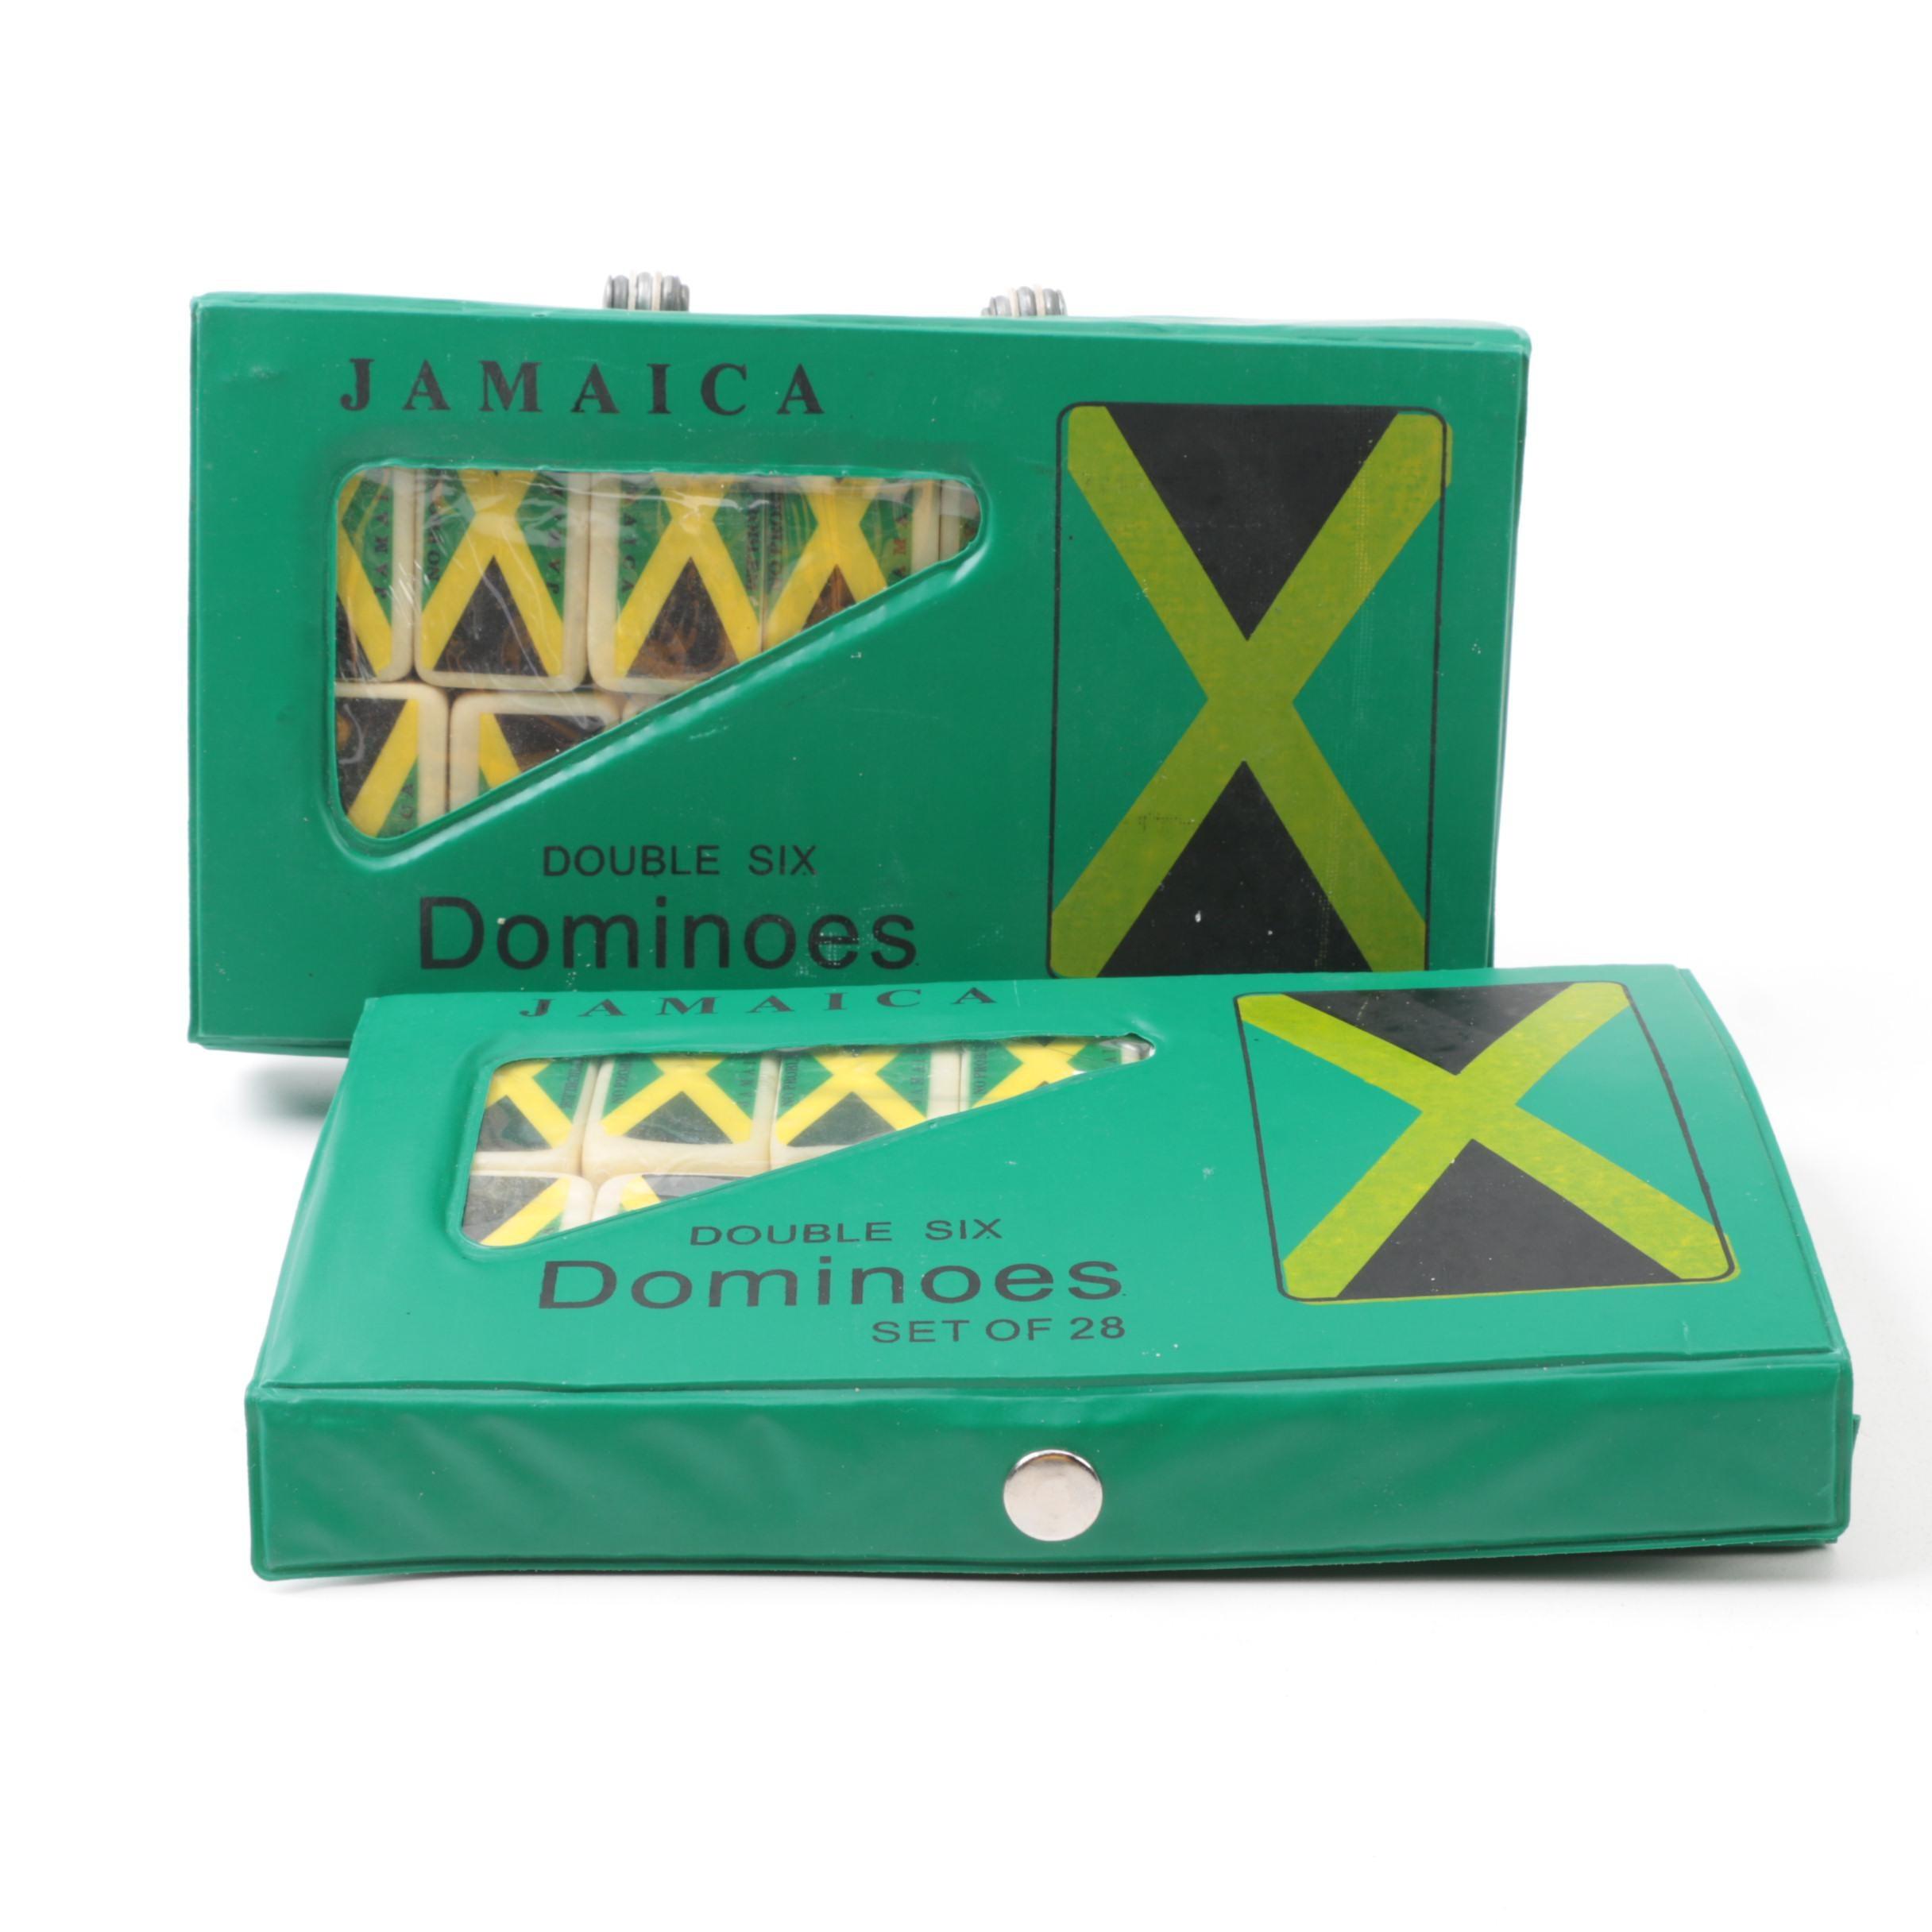 Jamaica Dominoes Sets